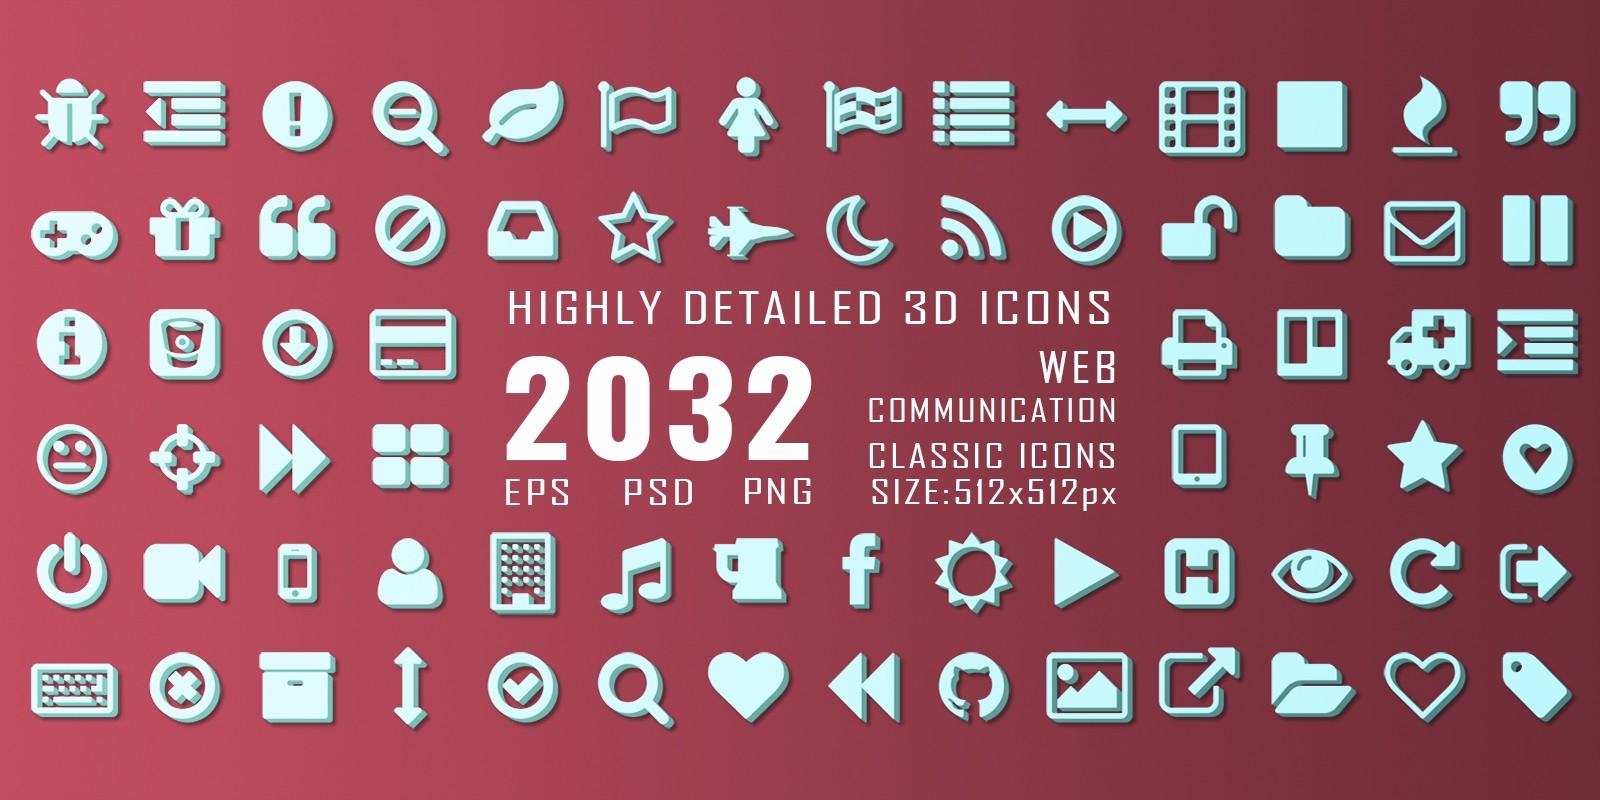 2032 3D Web Communication Icons Pack